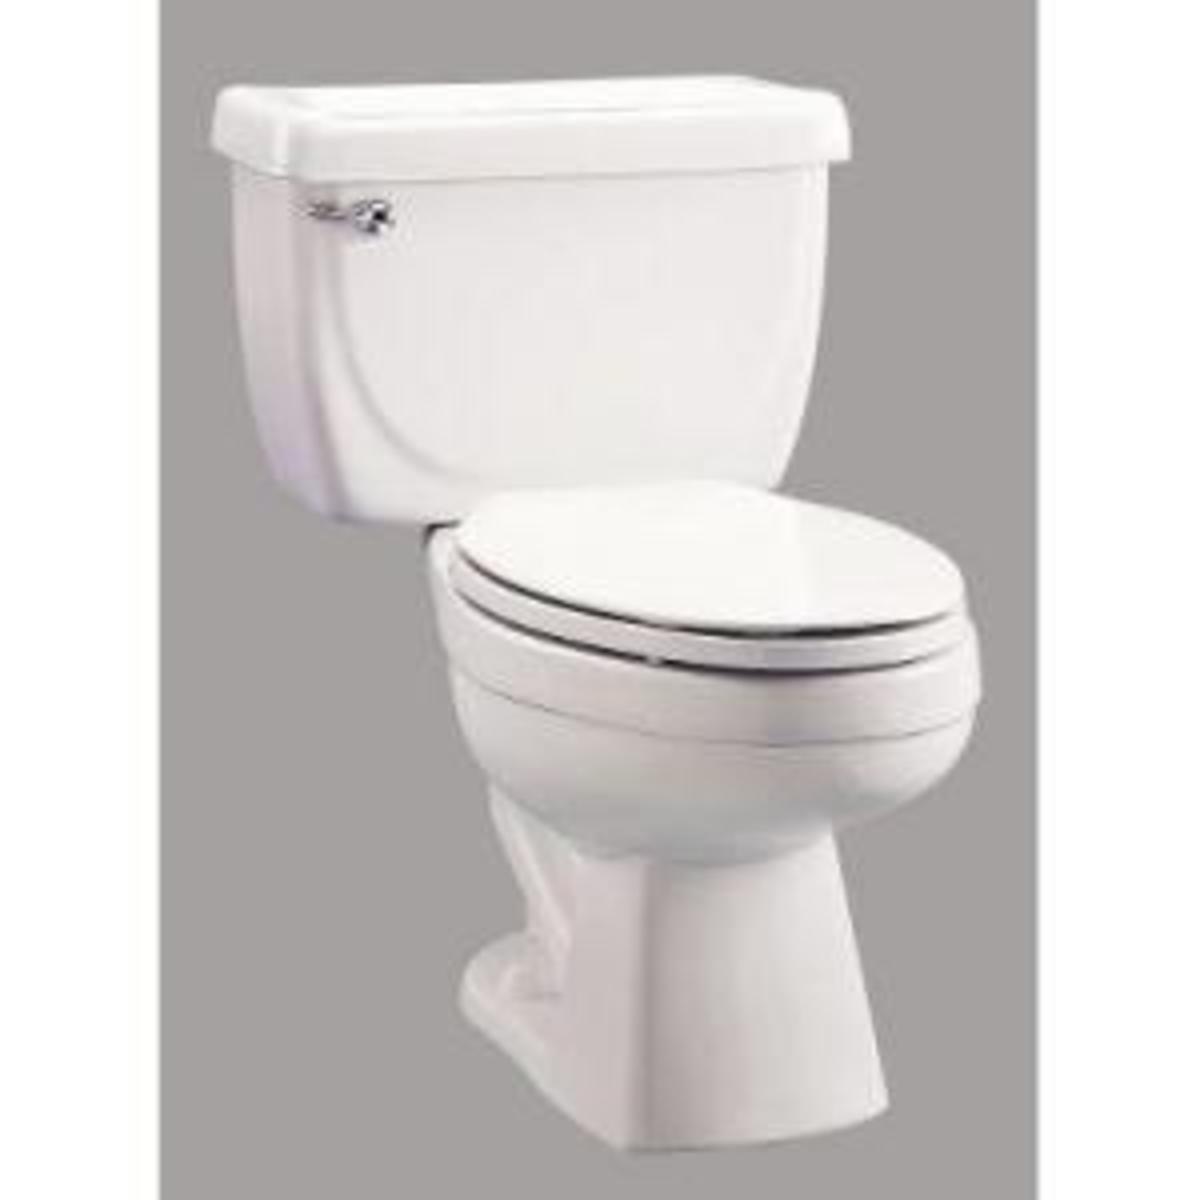 womens-restroom-etiquette